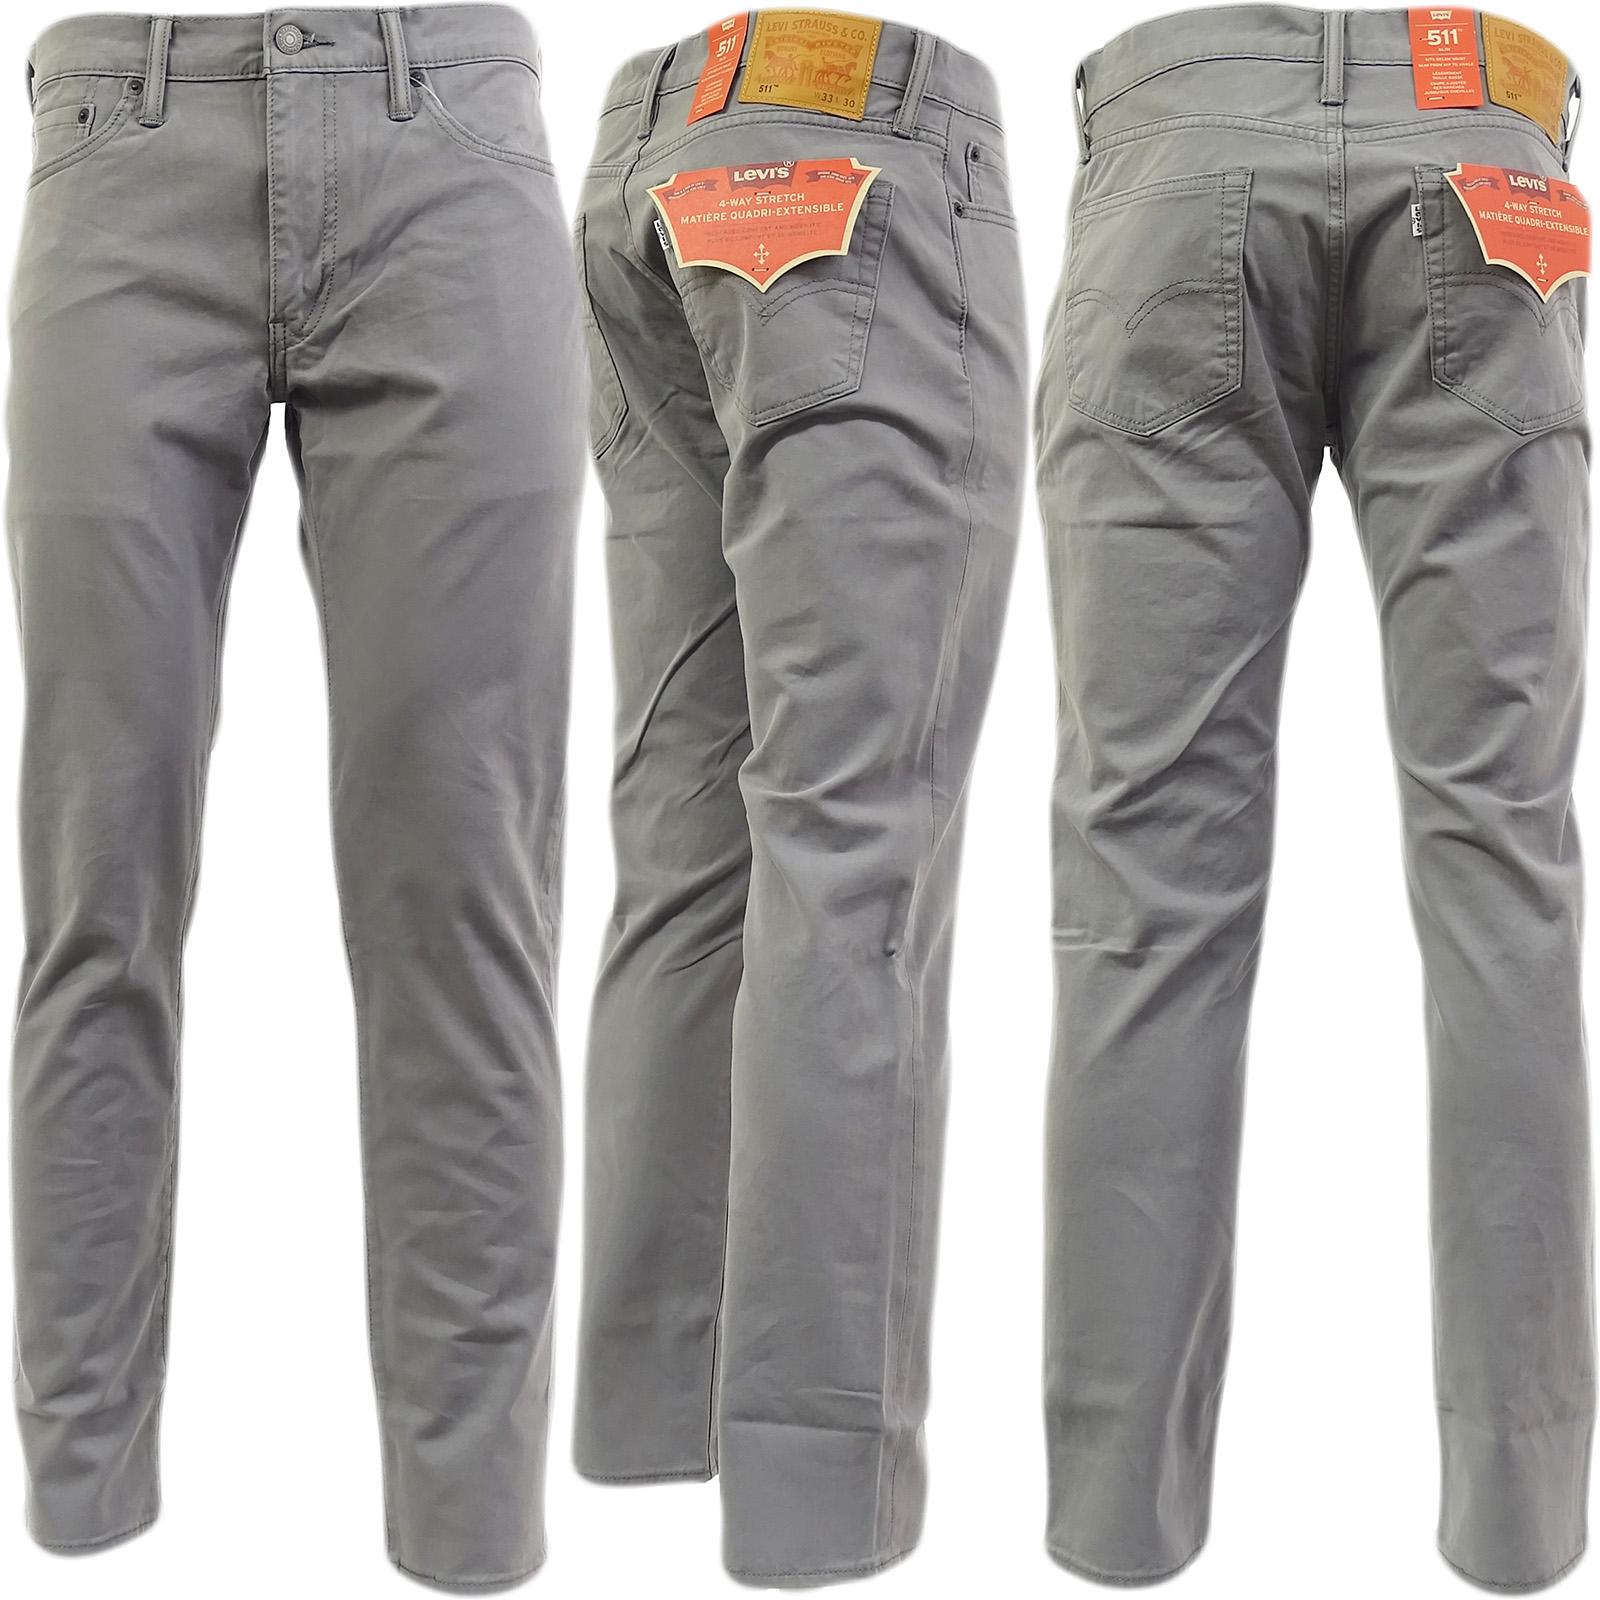 511 Ebay Jean Levi Leg Slim Chino Grey Strauss Steel 6xwA1pq5